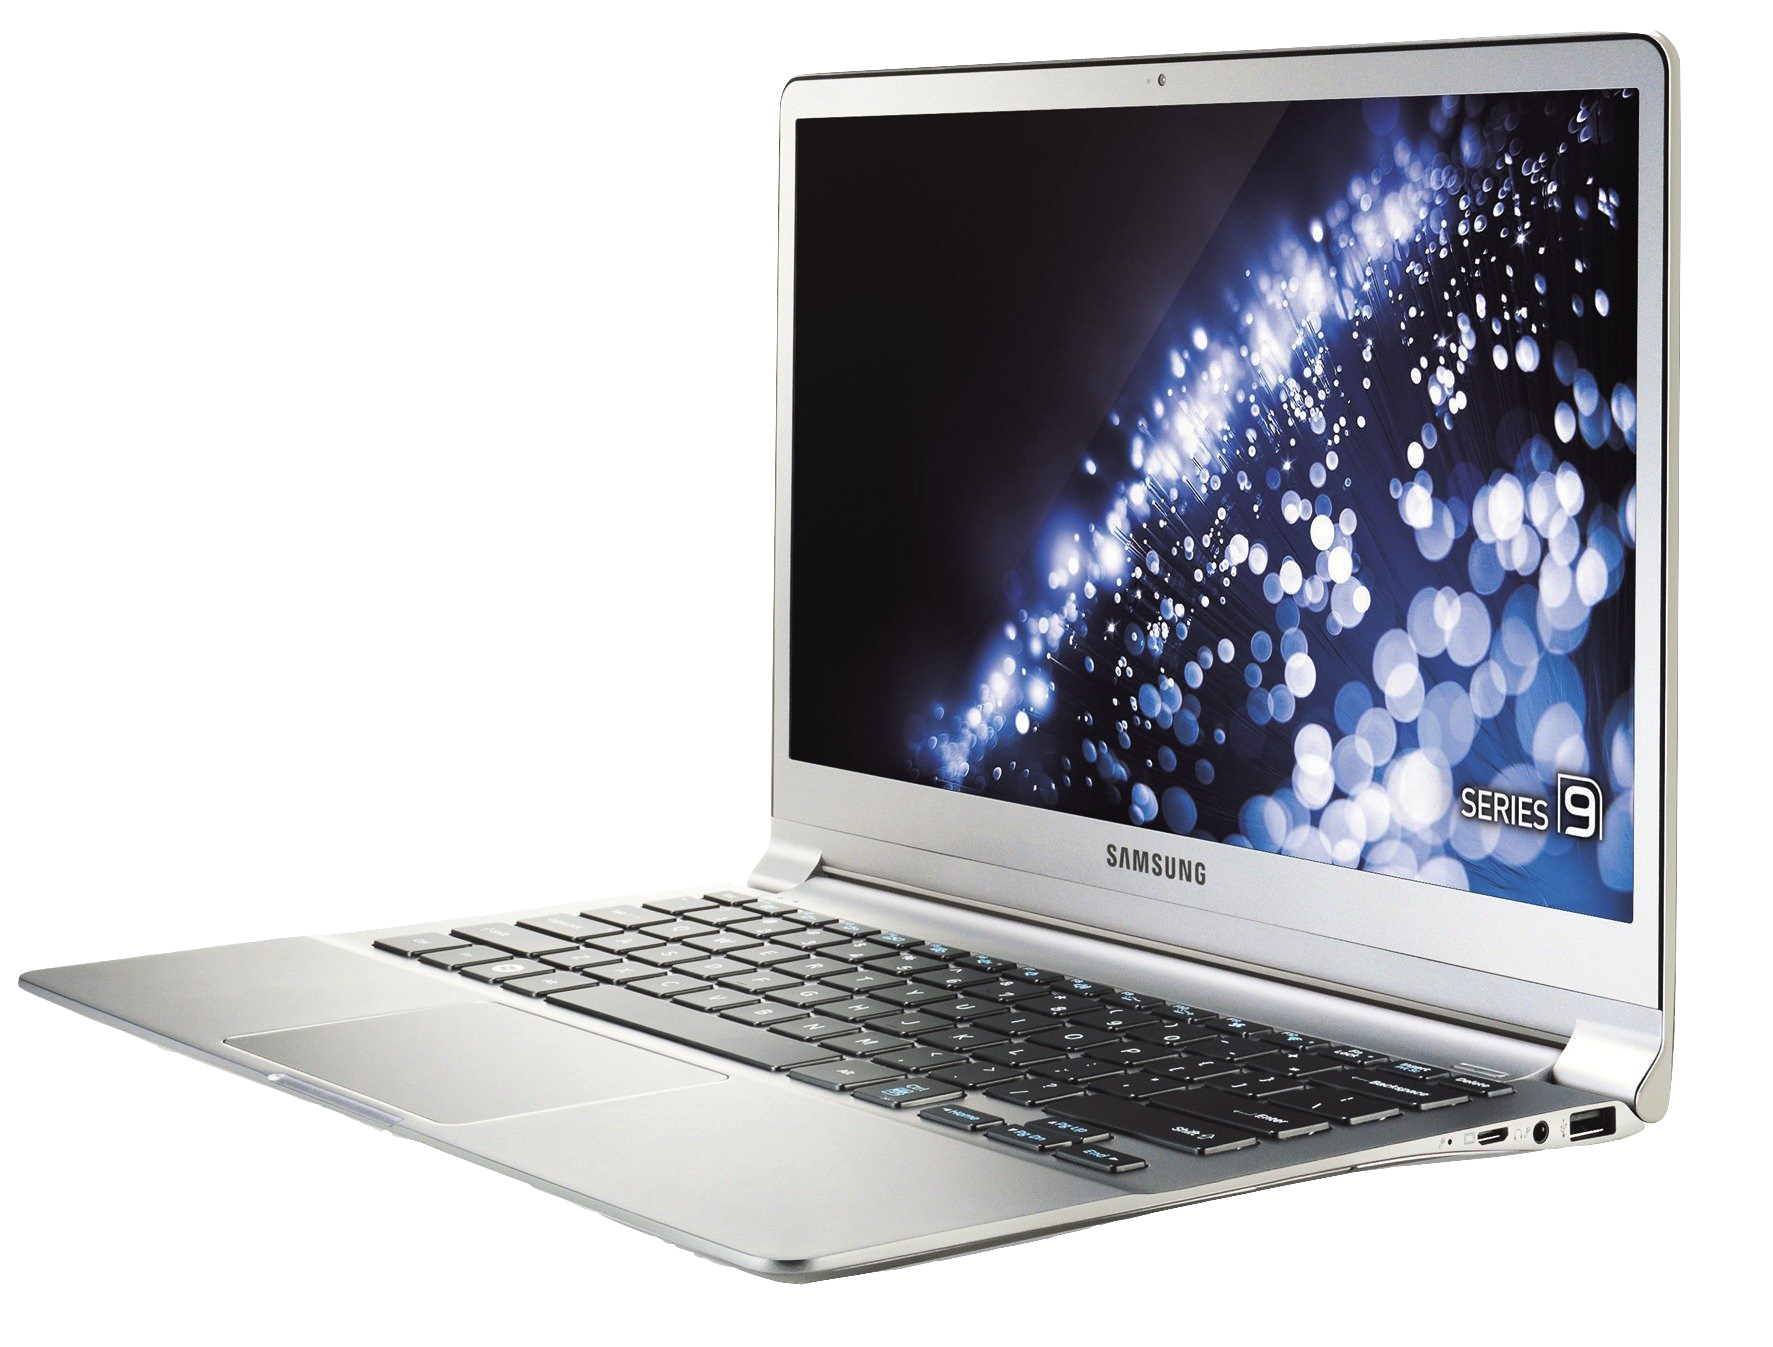 Laptop notebook PNG image - Laptop PNG